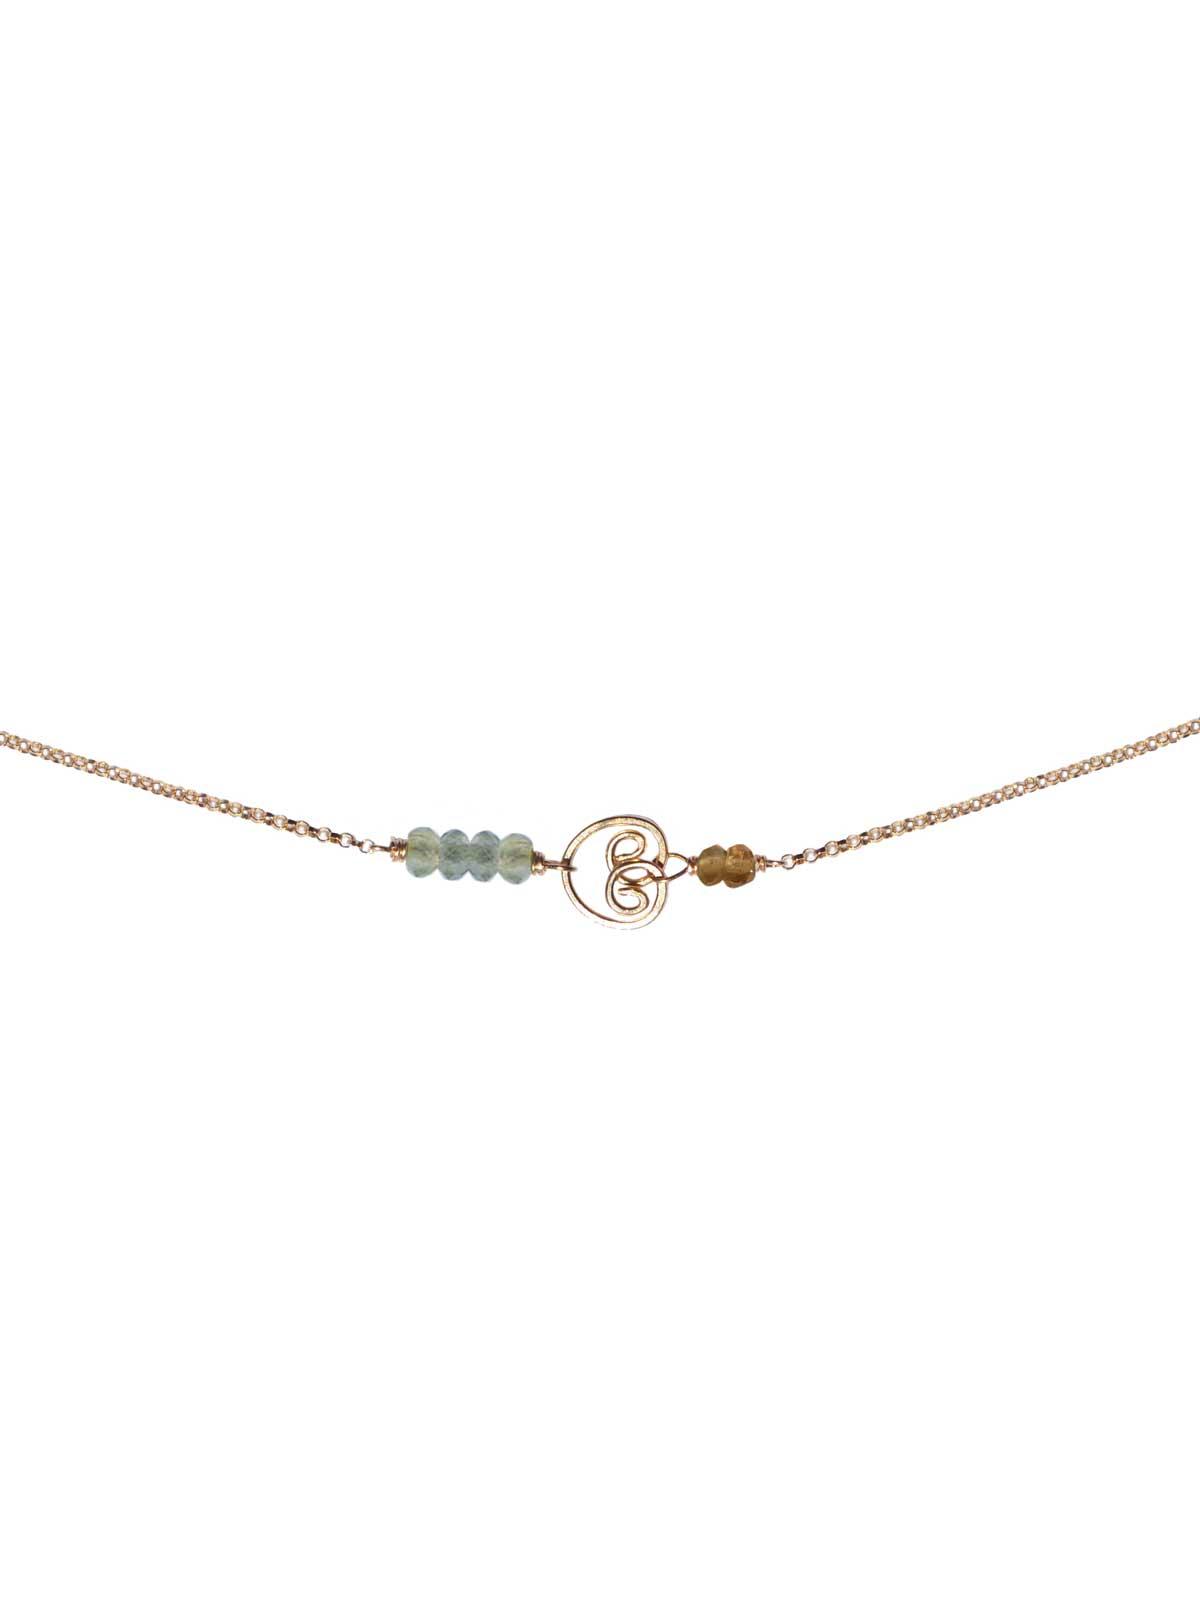 Necklace 14K Gold-filled chain semi-precious stones : faceted Prehnite Tourmaline